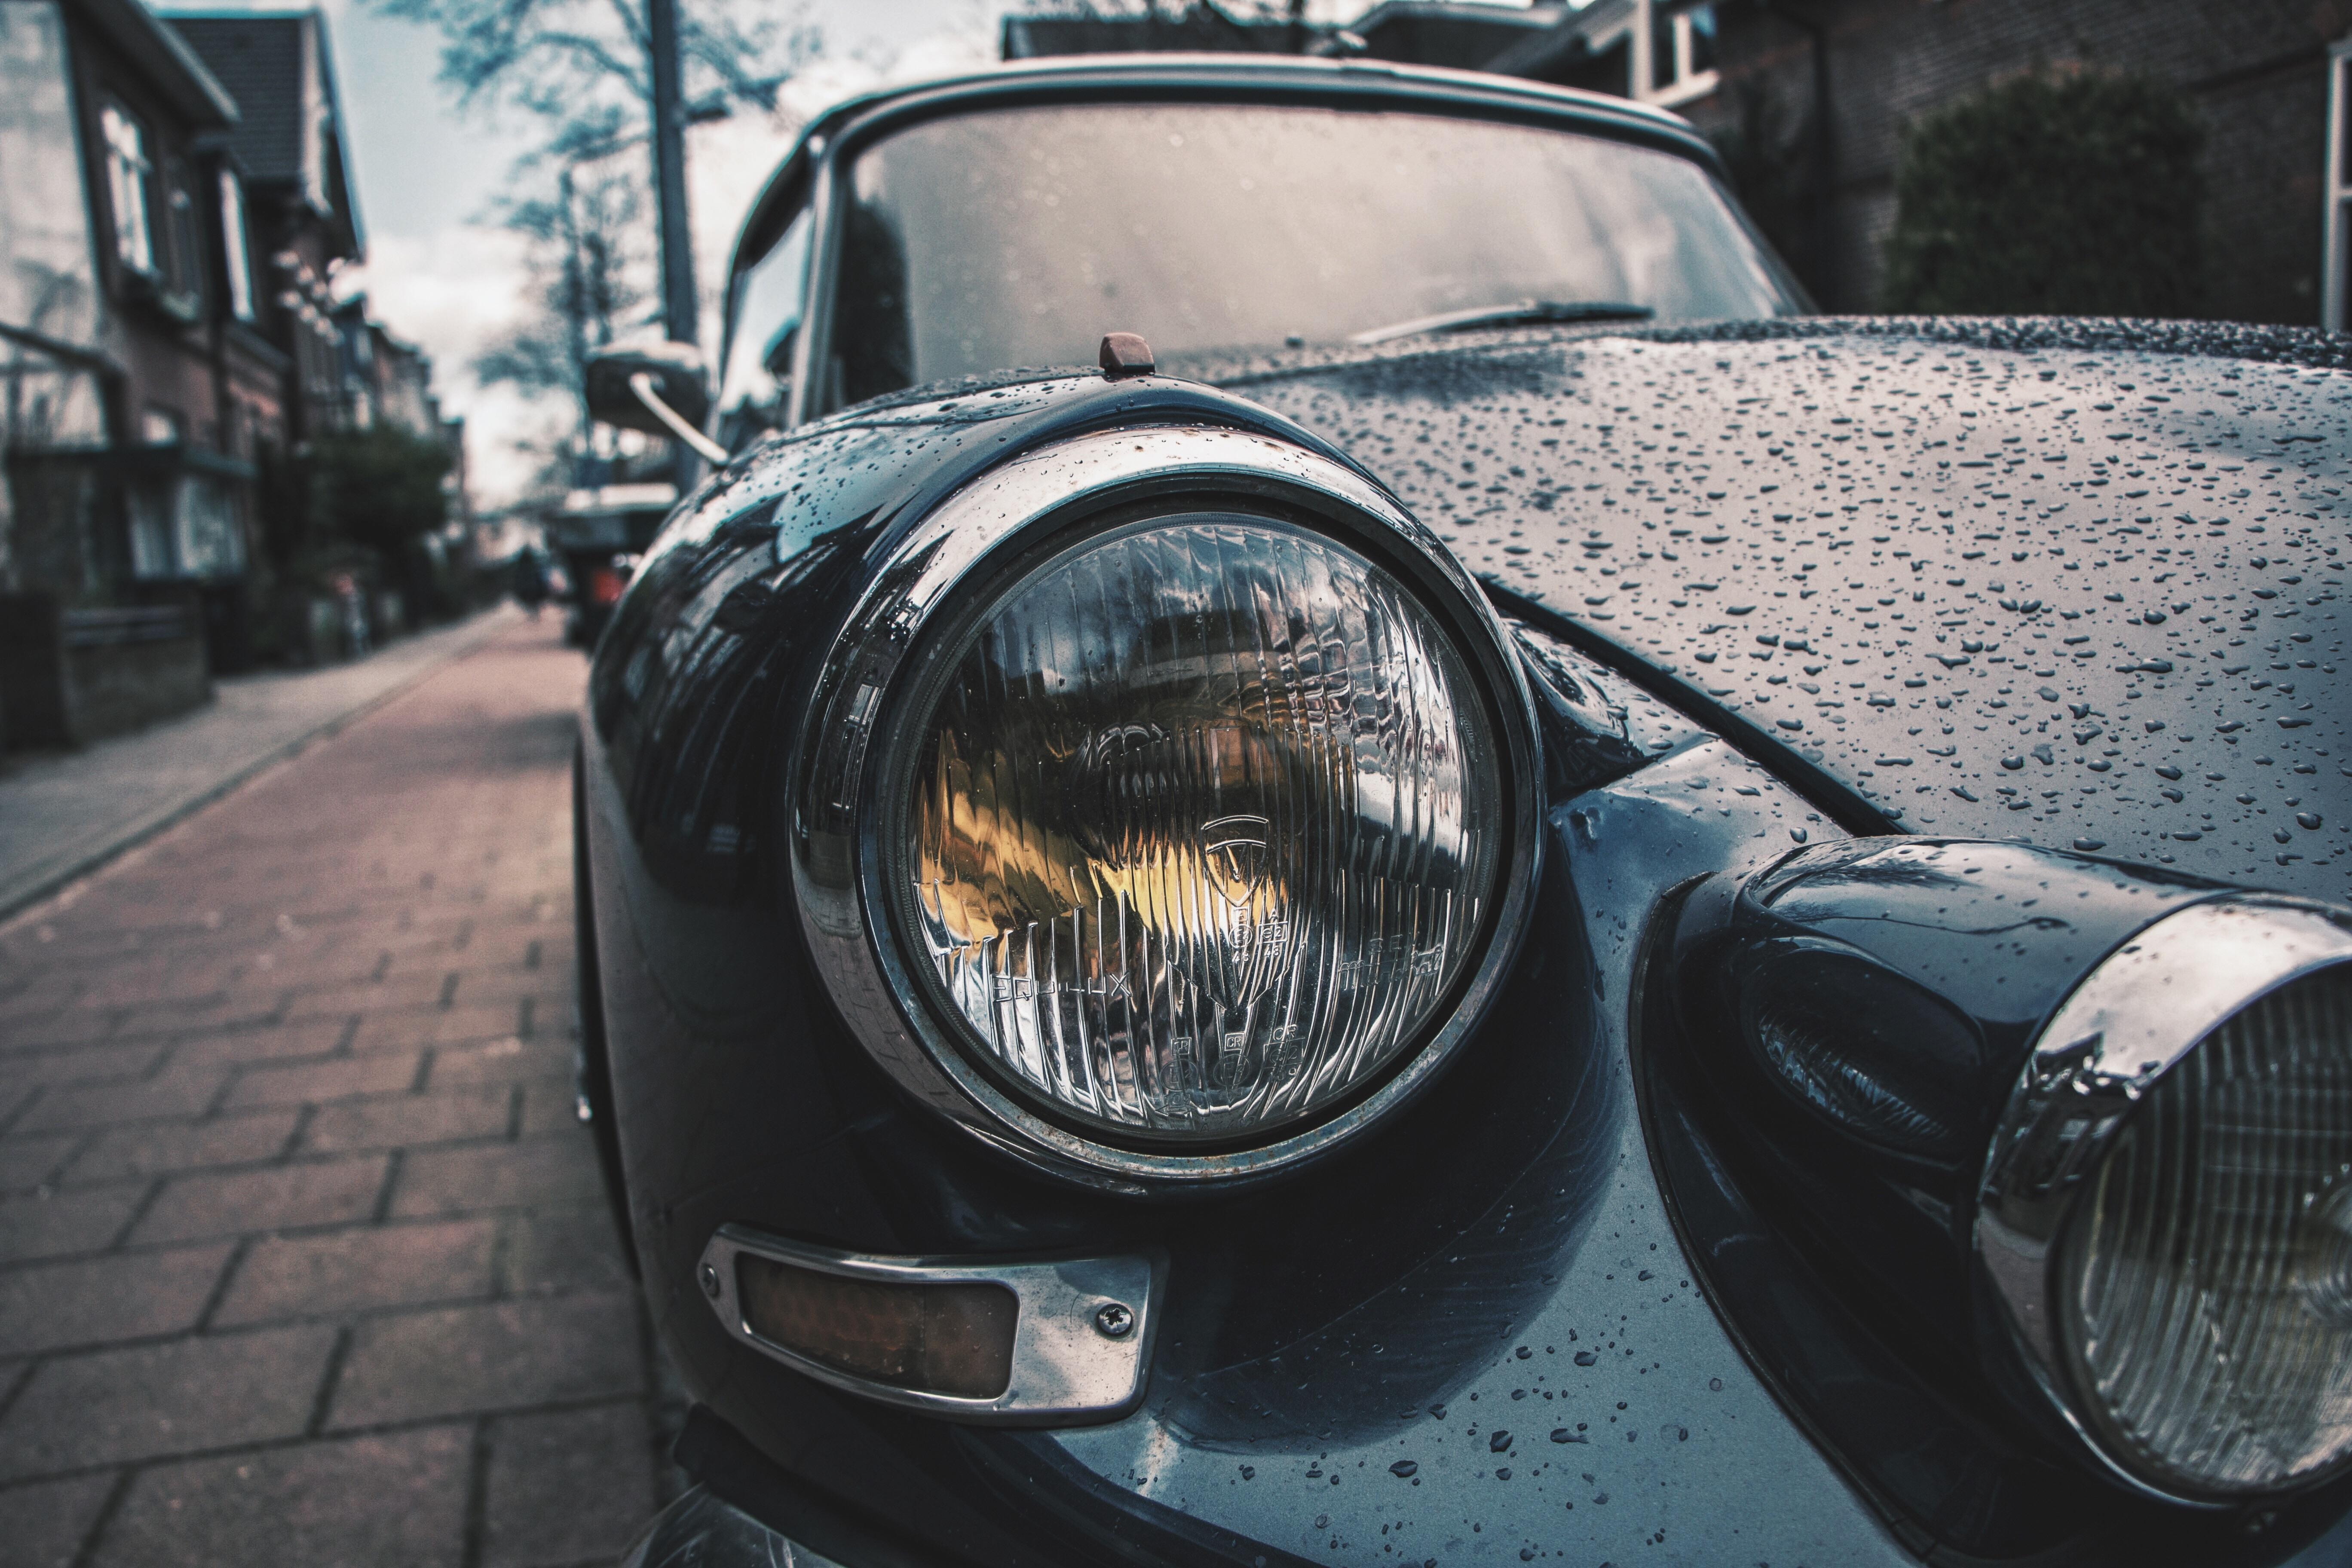 Headlight, Car, Control, Light, Luxury, HQ Photo